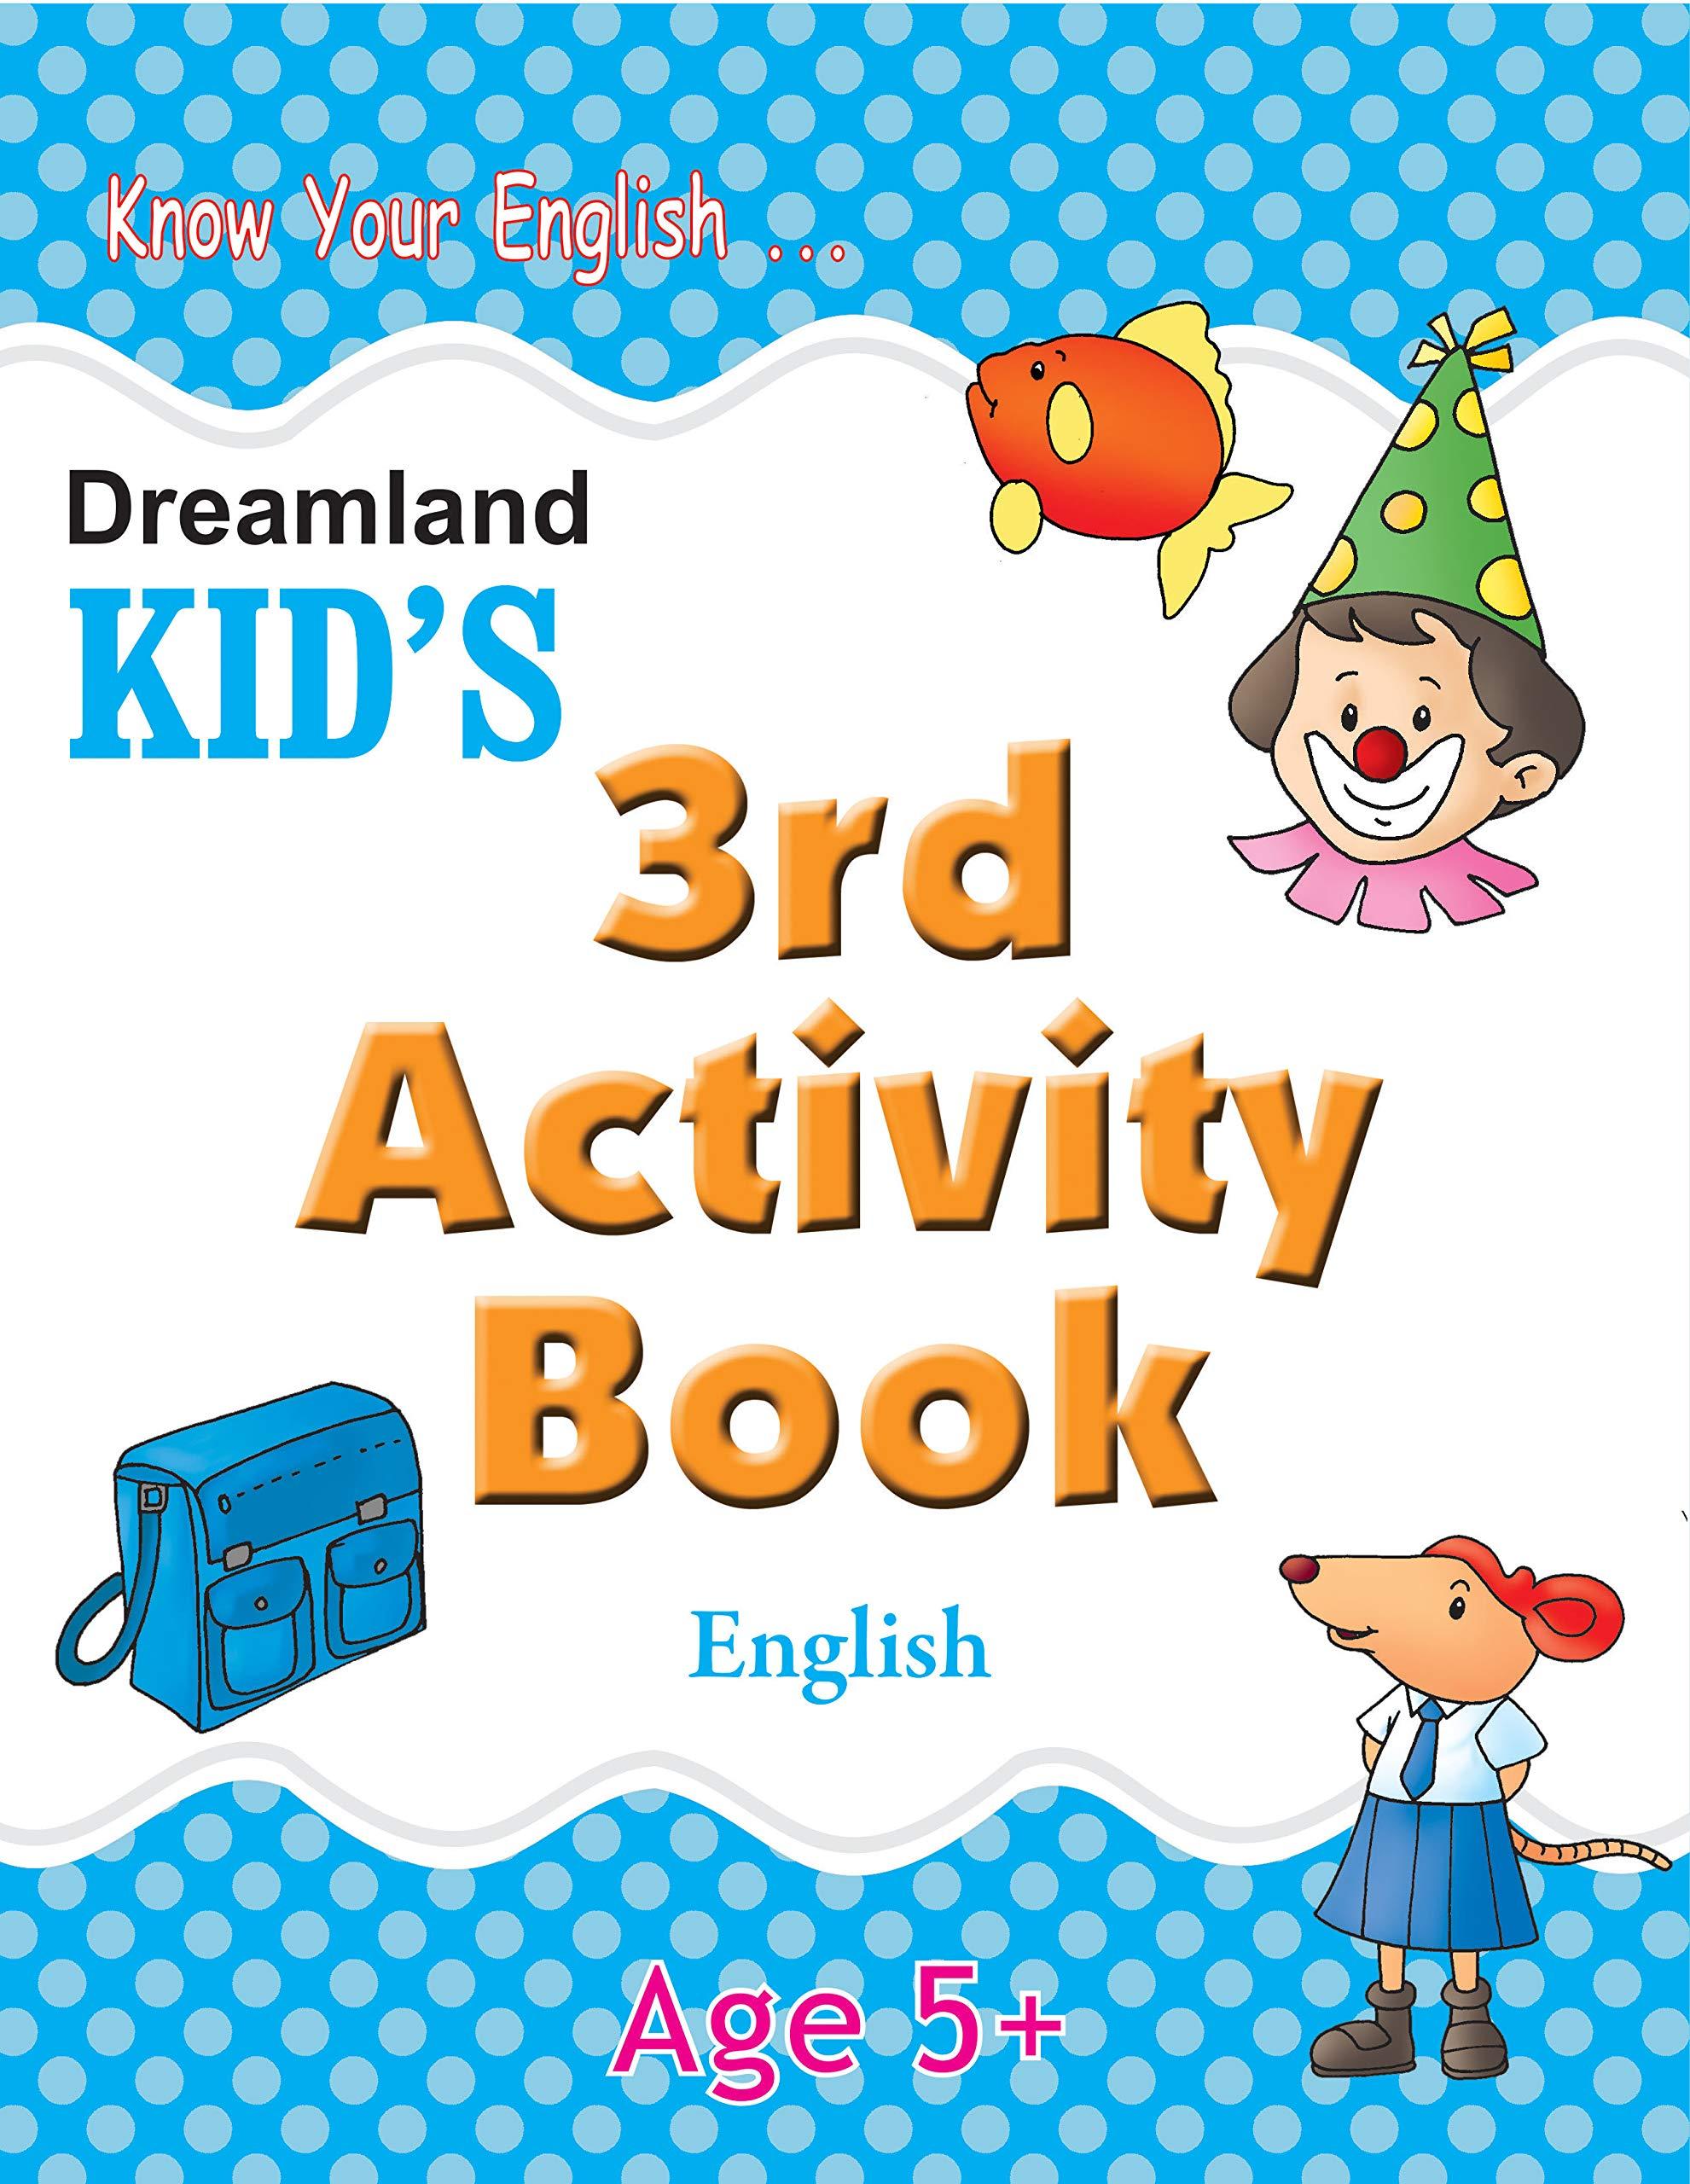 3rd Activity Book - English